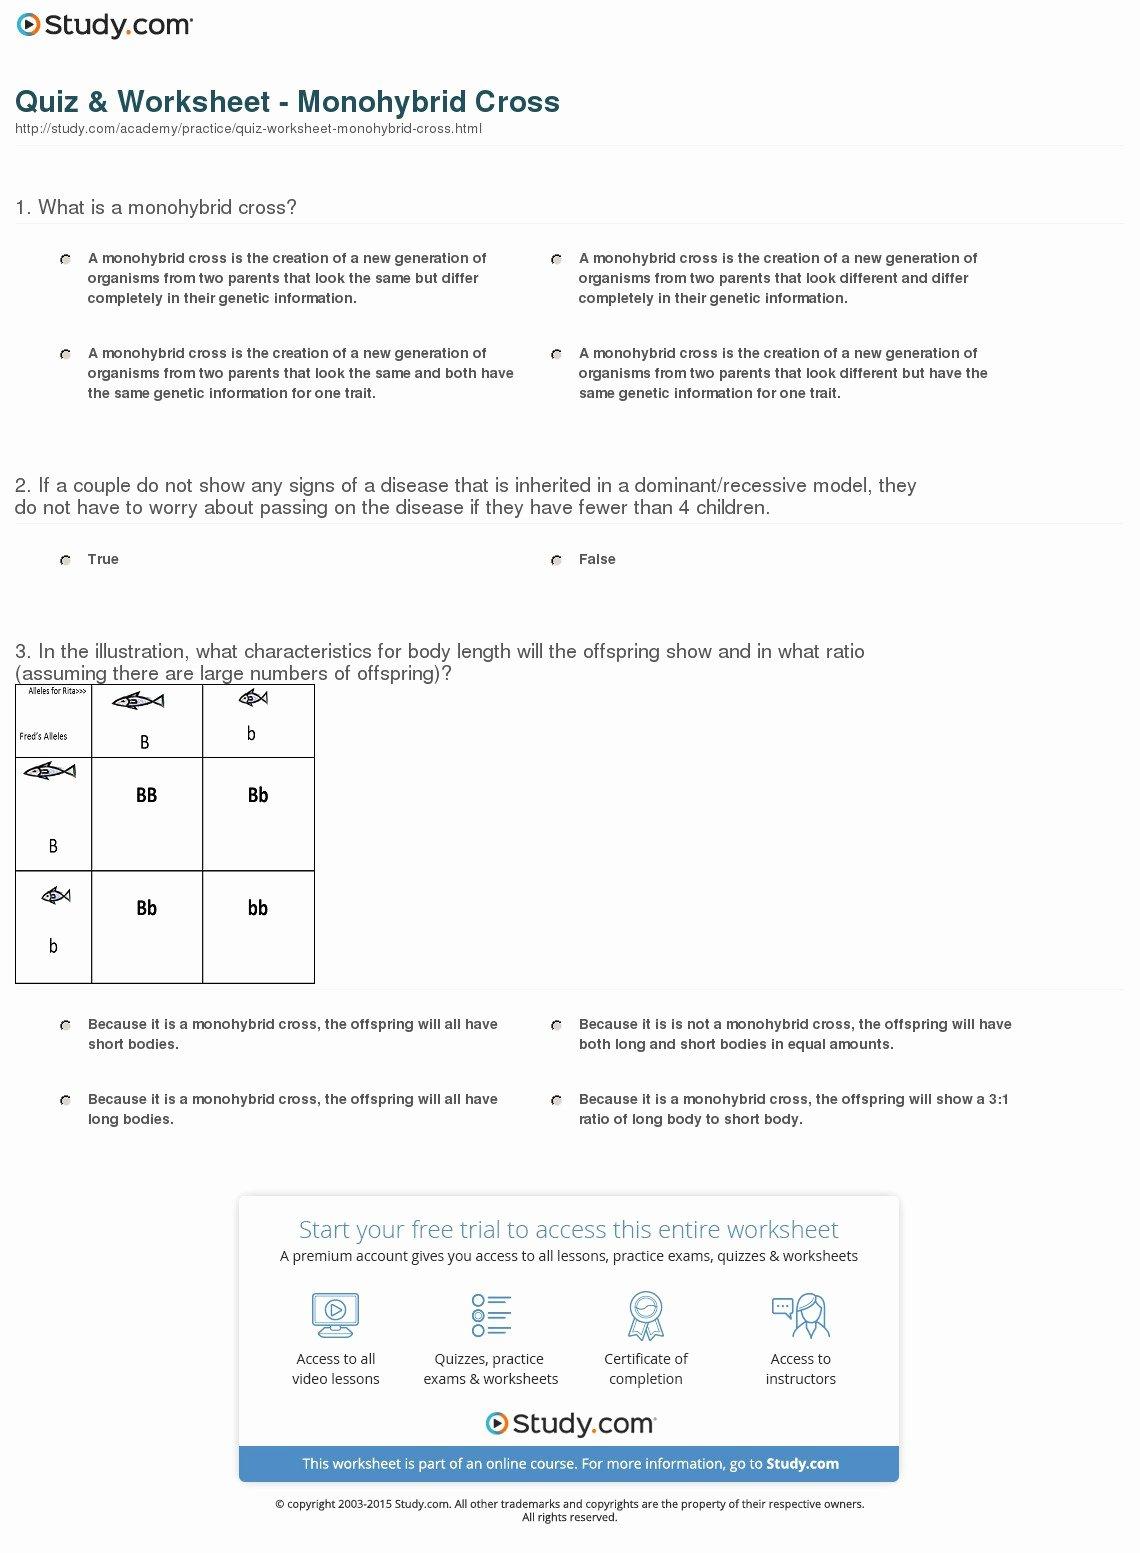 Monohybrid Cross Practice Problems Worksheet New Monohybrid Cross Worksheet